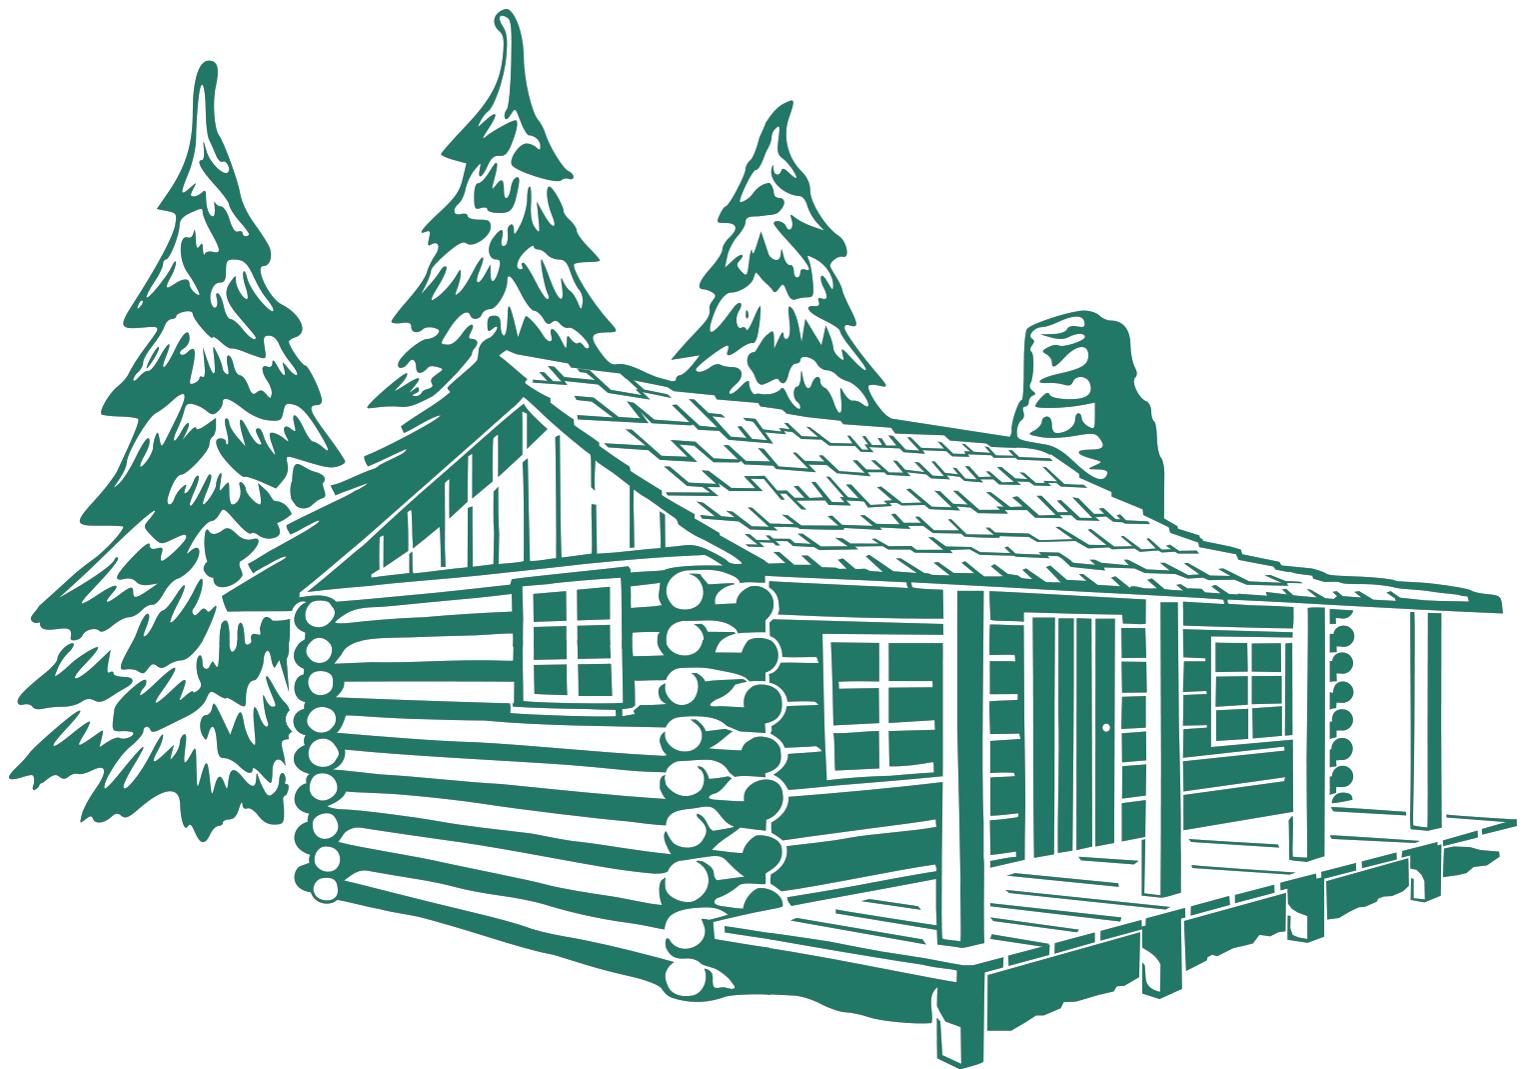 Wooden cabins clipart jpg black and white download log cabin clip art log cabin   Doodle Idea\'s   Wooden cabins ... jpg black and white download